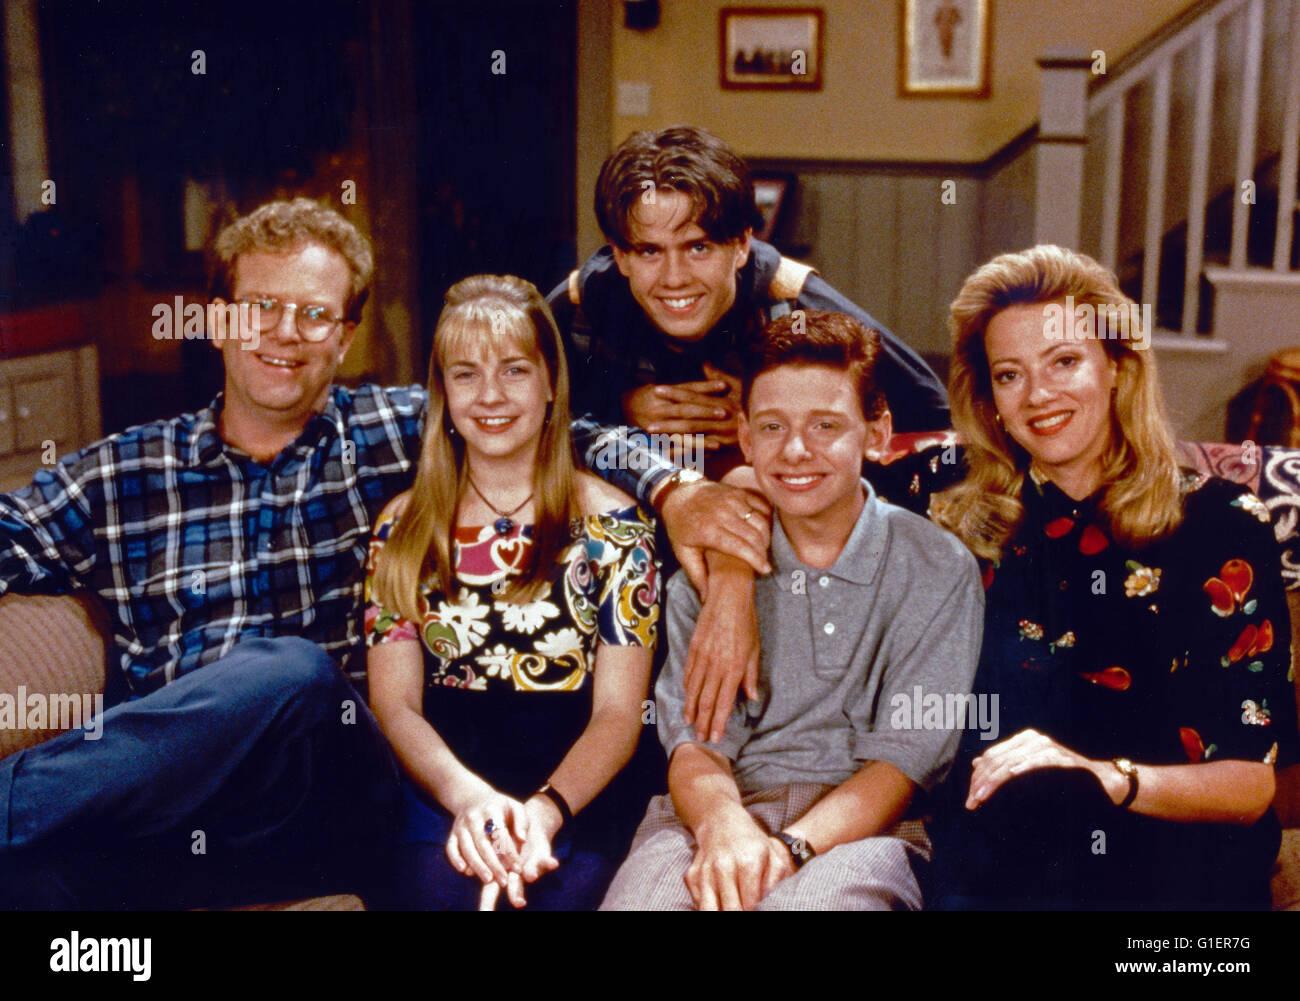 Clarissa explica tudo, aka: Clarissa, Teenagerserie; EUA 1991 - 1994, Darsteller: (v. l.) Joe O'Connor, Melissa Imagens de Stock